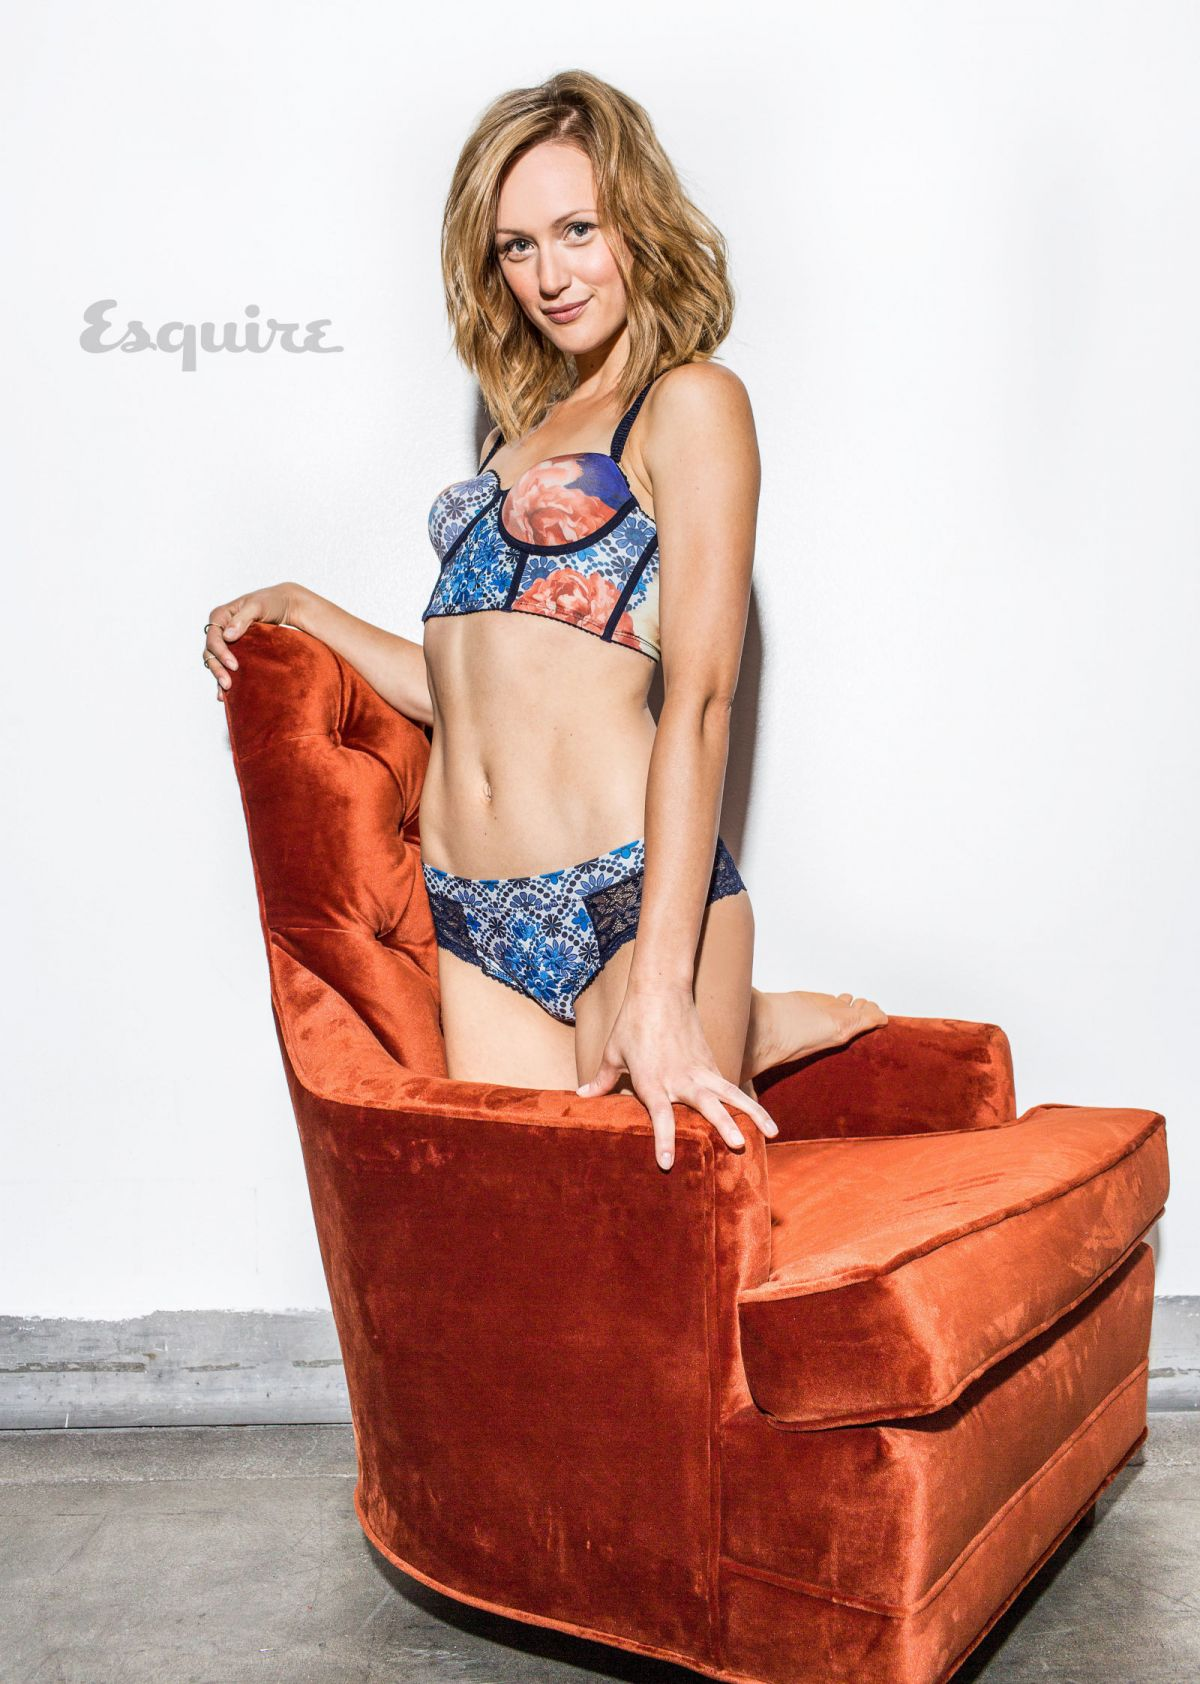 Hot Kerry Bishe nudes (75 photo), Ass, Paparazzi, Feet, in bikini 2018